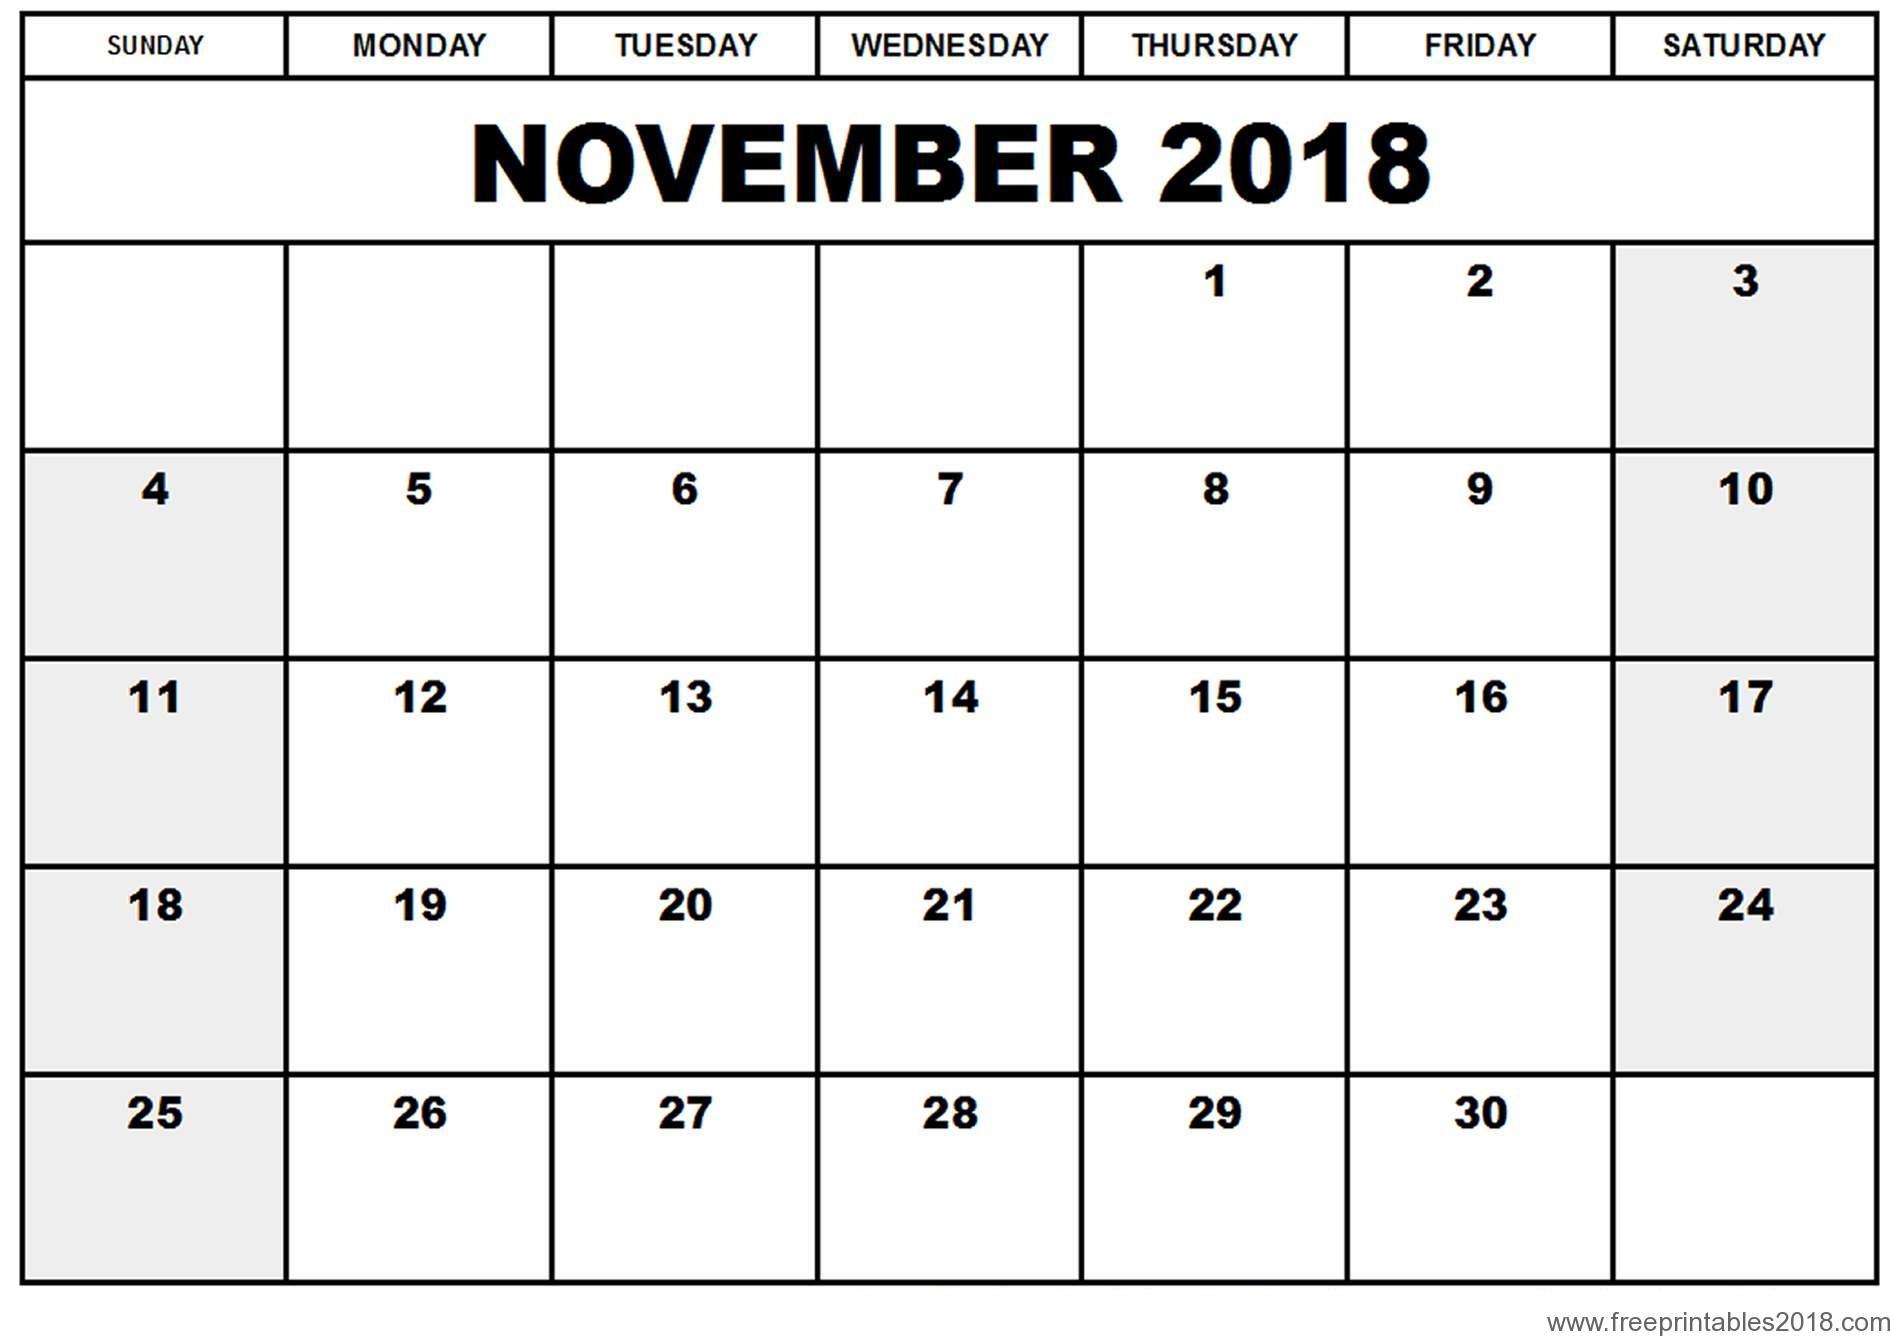 Free Printable Calendar November 2018 | Free Printables 2019 for Blank Printable November Calendar